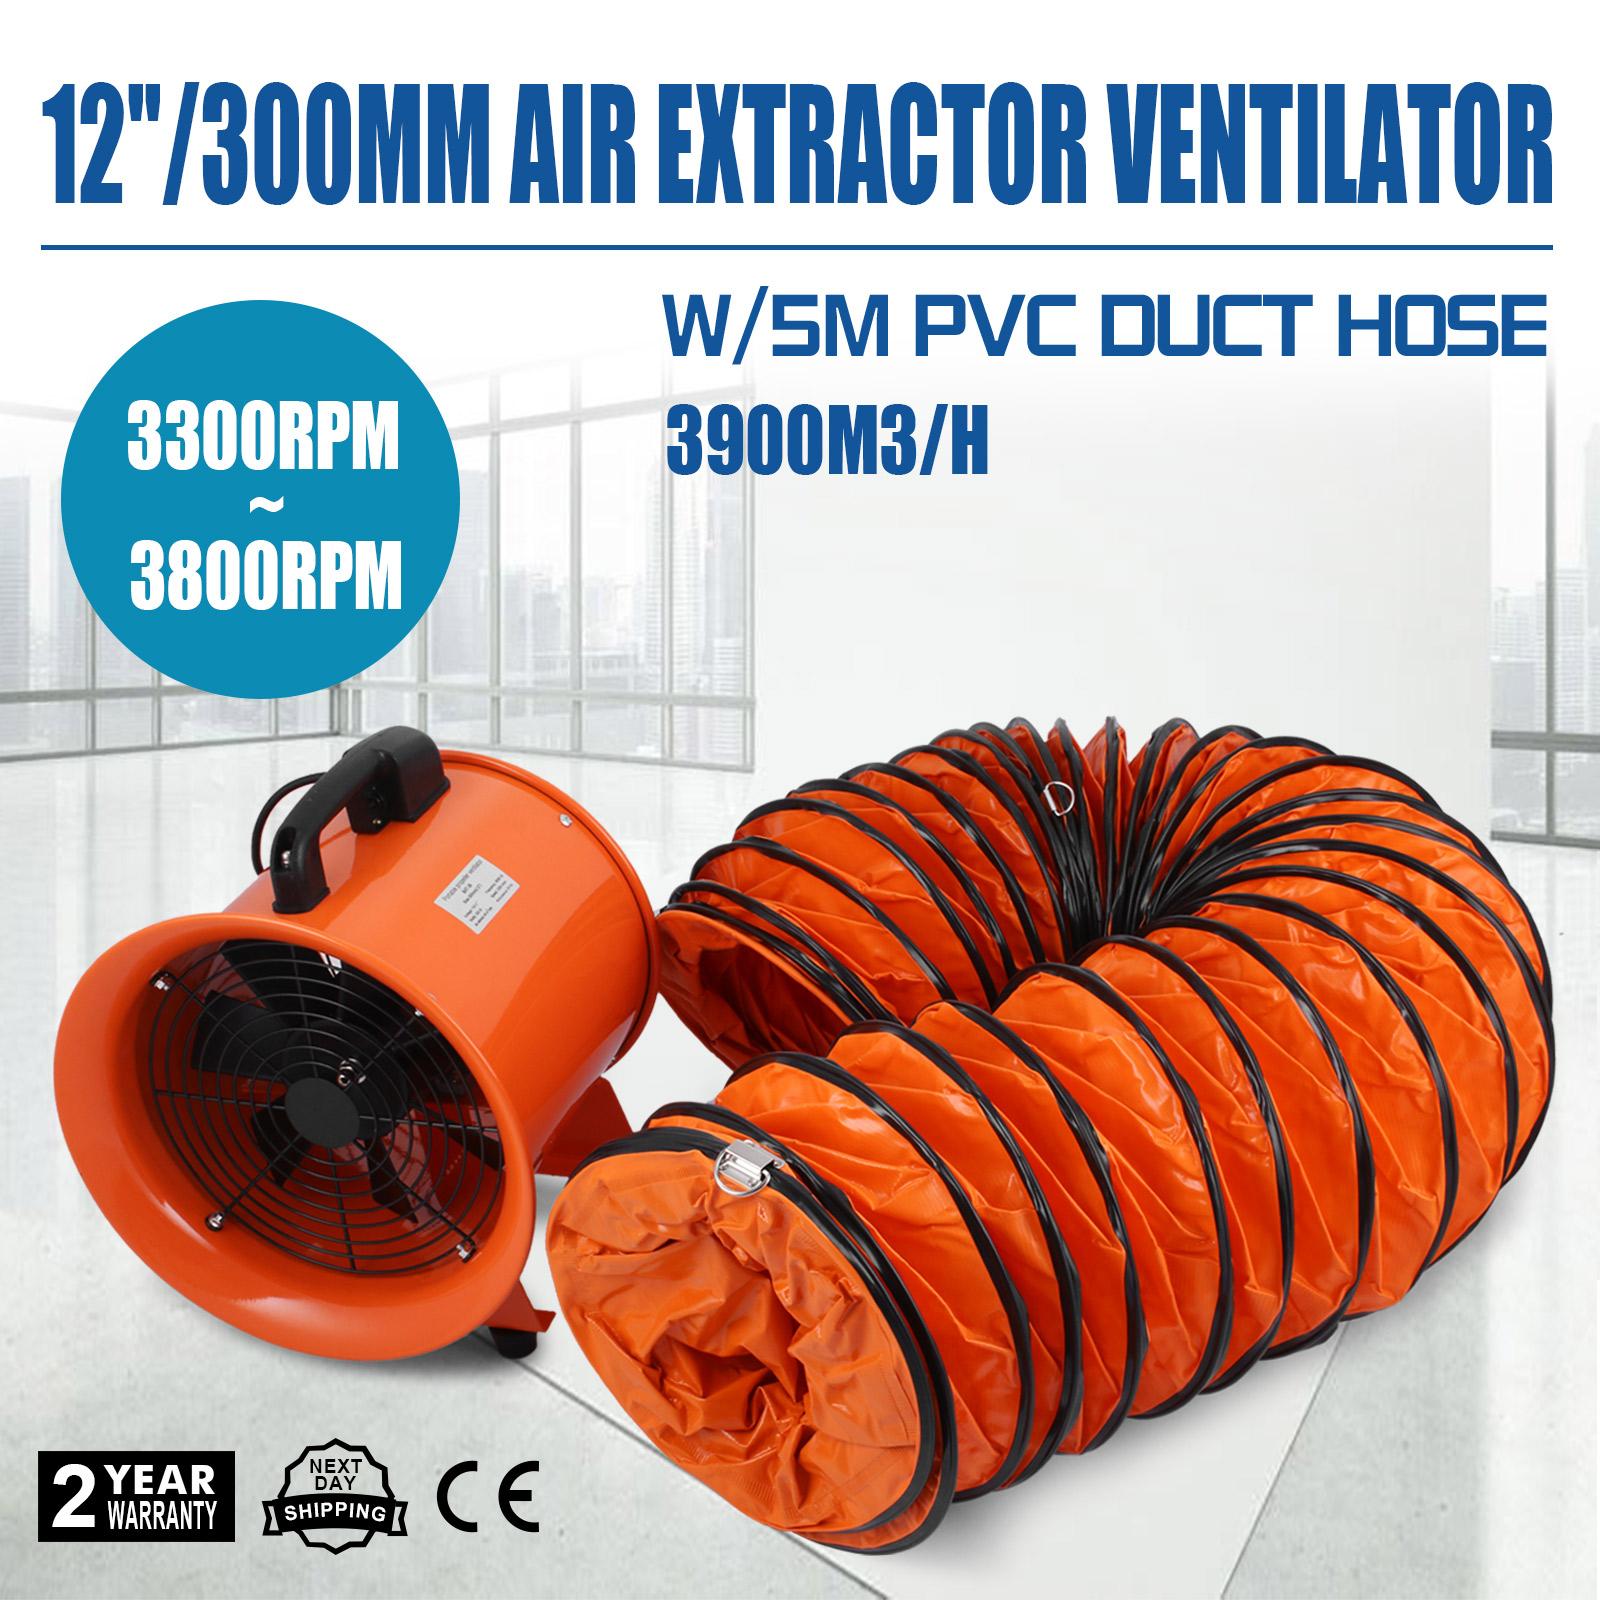 Blower Fan With Hose : Quot industrial extractor fan blower w duct hose low noise